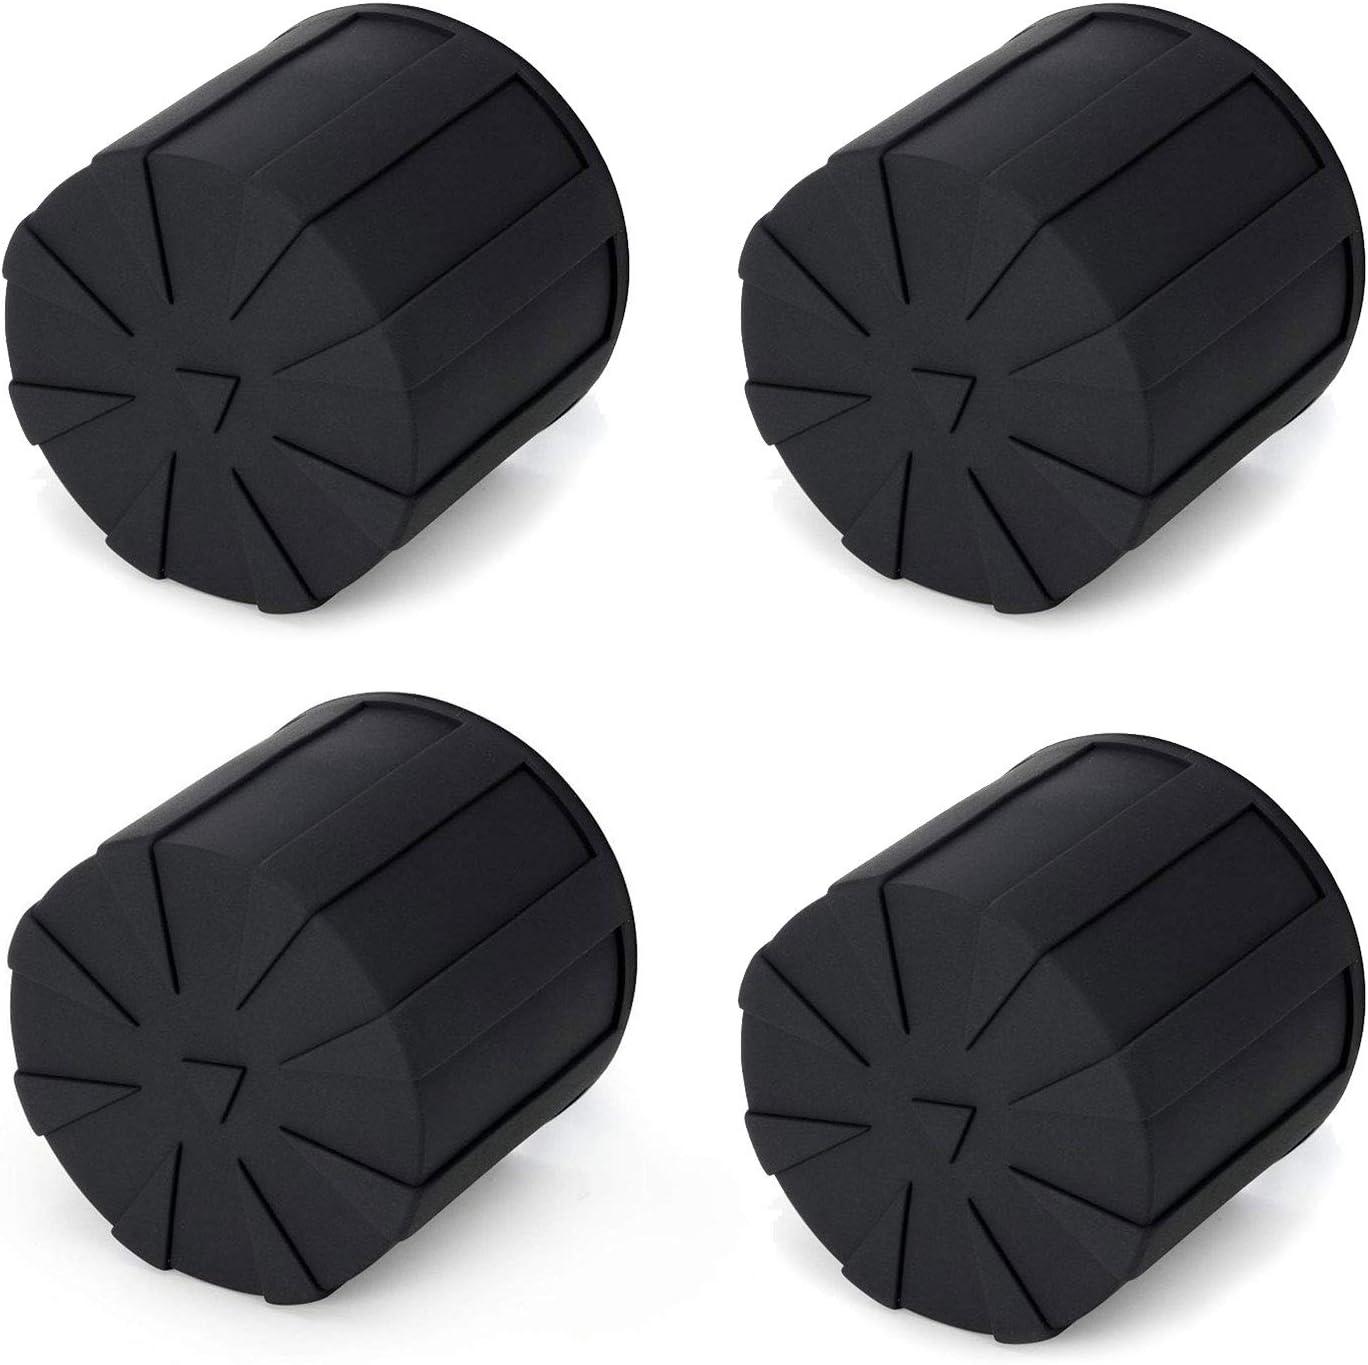 Digislider Silicone Universal Lens Cap - Fits Over 99% of Lenses, Scratch Proof, Waterproof, Dustproof, Shock-Absorbent, Lens Cover for 60-100mm Lenses (4-Pack)